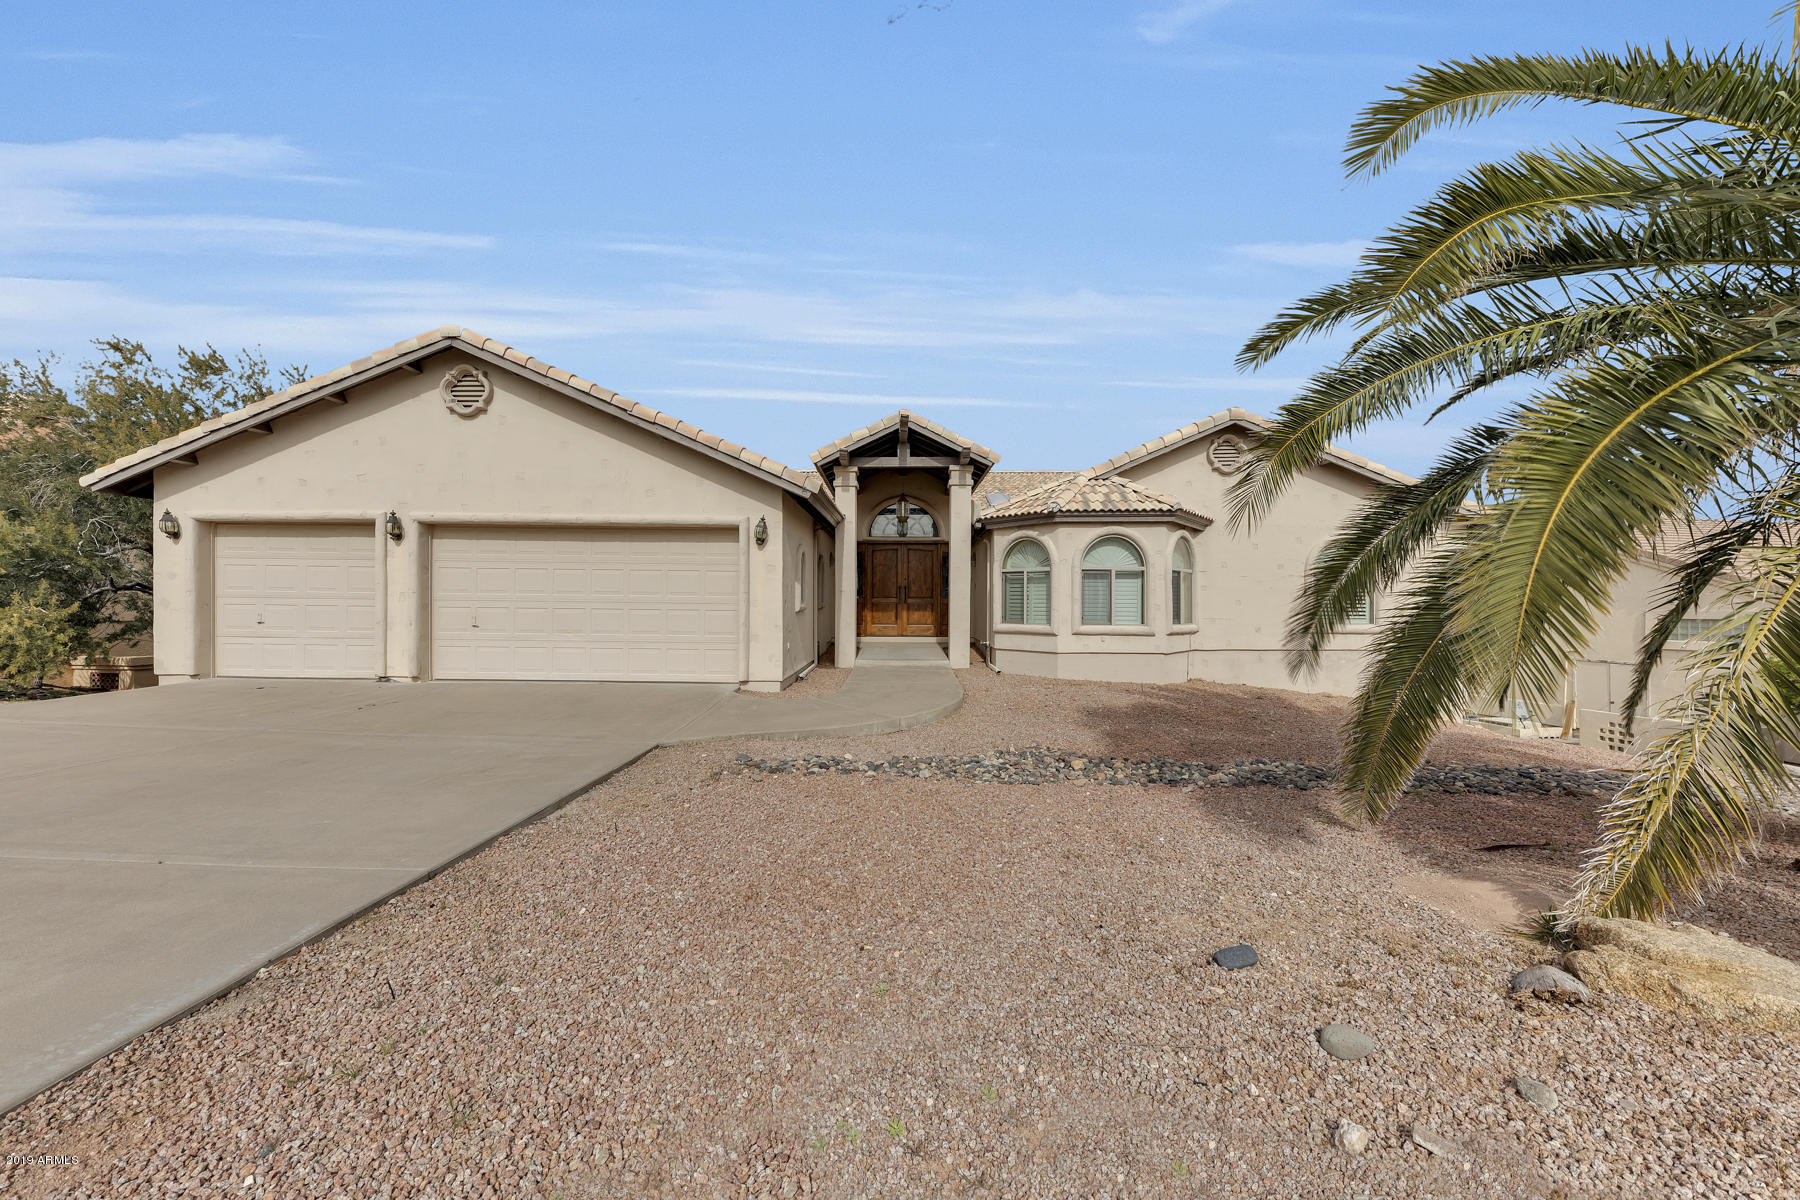 Photo of 15414 E THISTLE Drive, Fountain Hills, AZ 85268